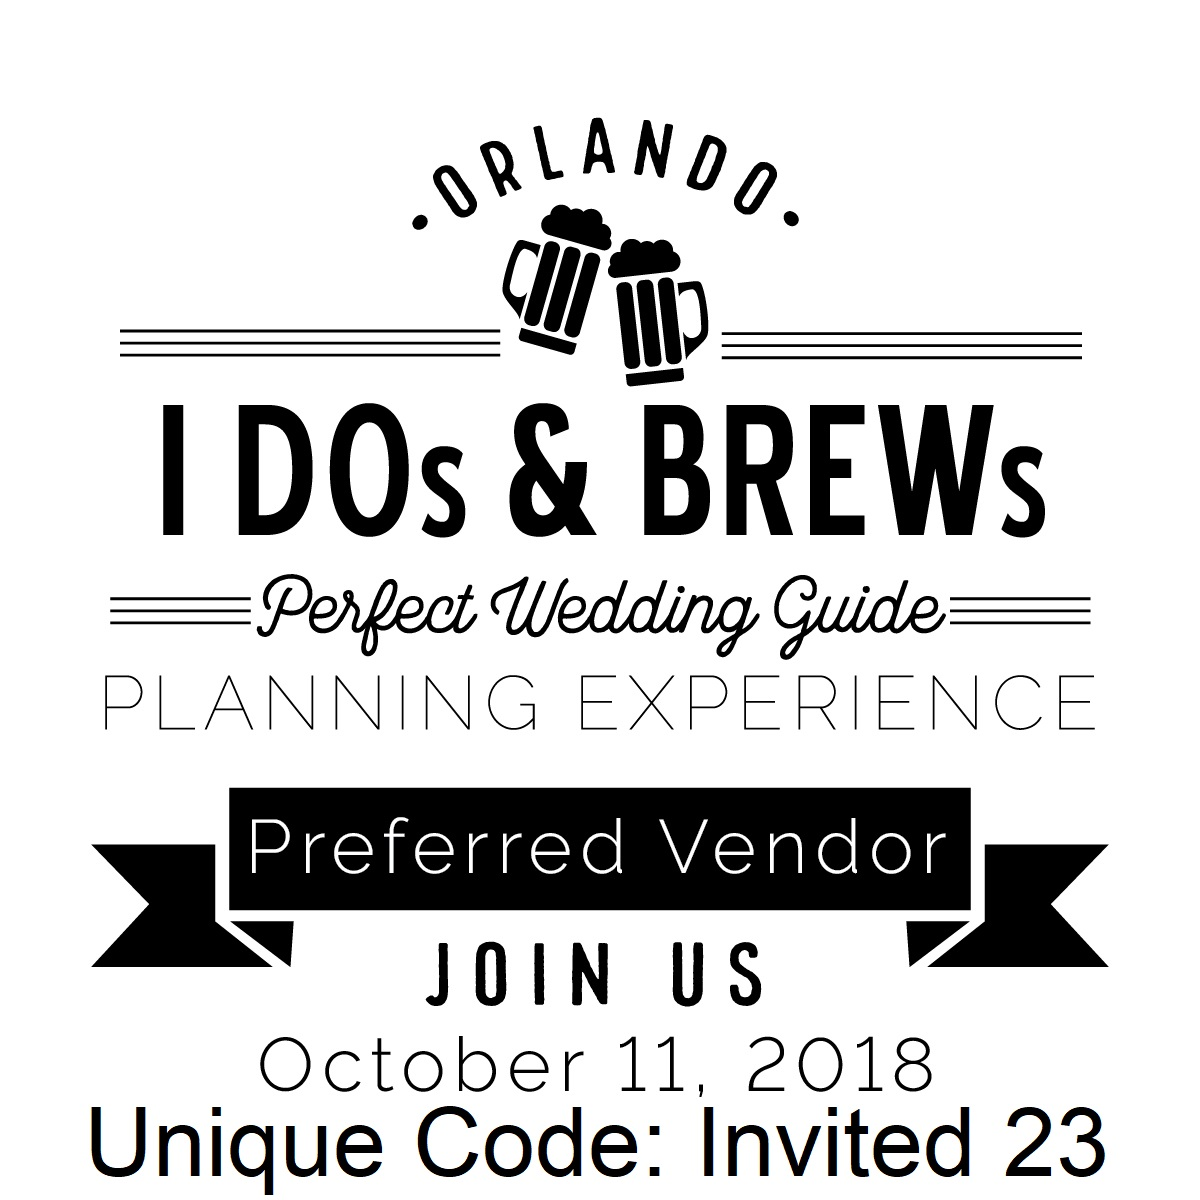 2018-10-11-I-Dos-and-Brews-Badge-Vendor Invited 23.jpg